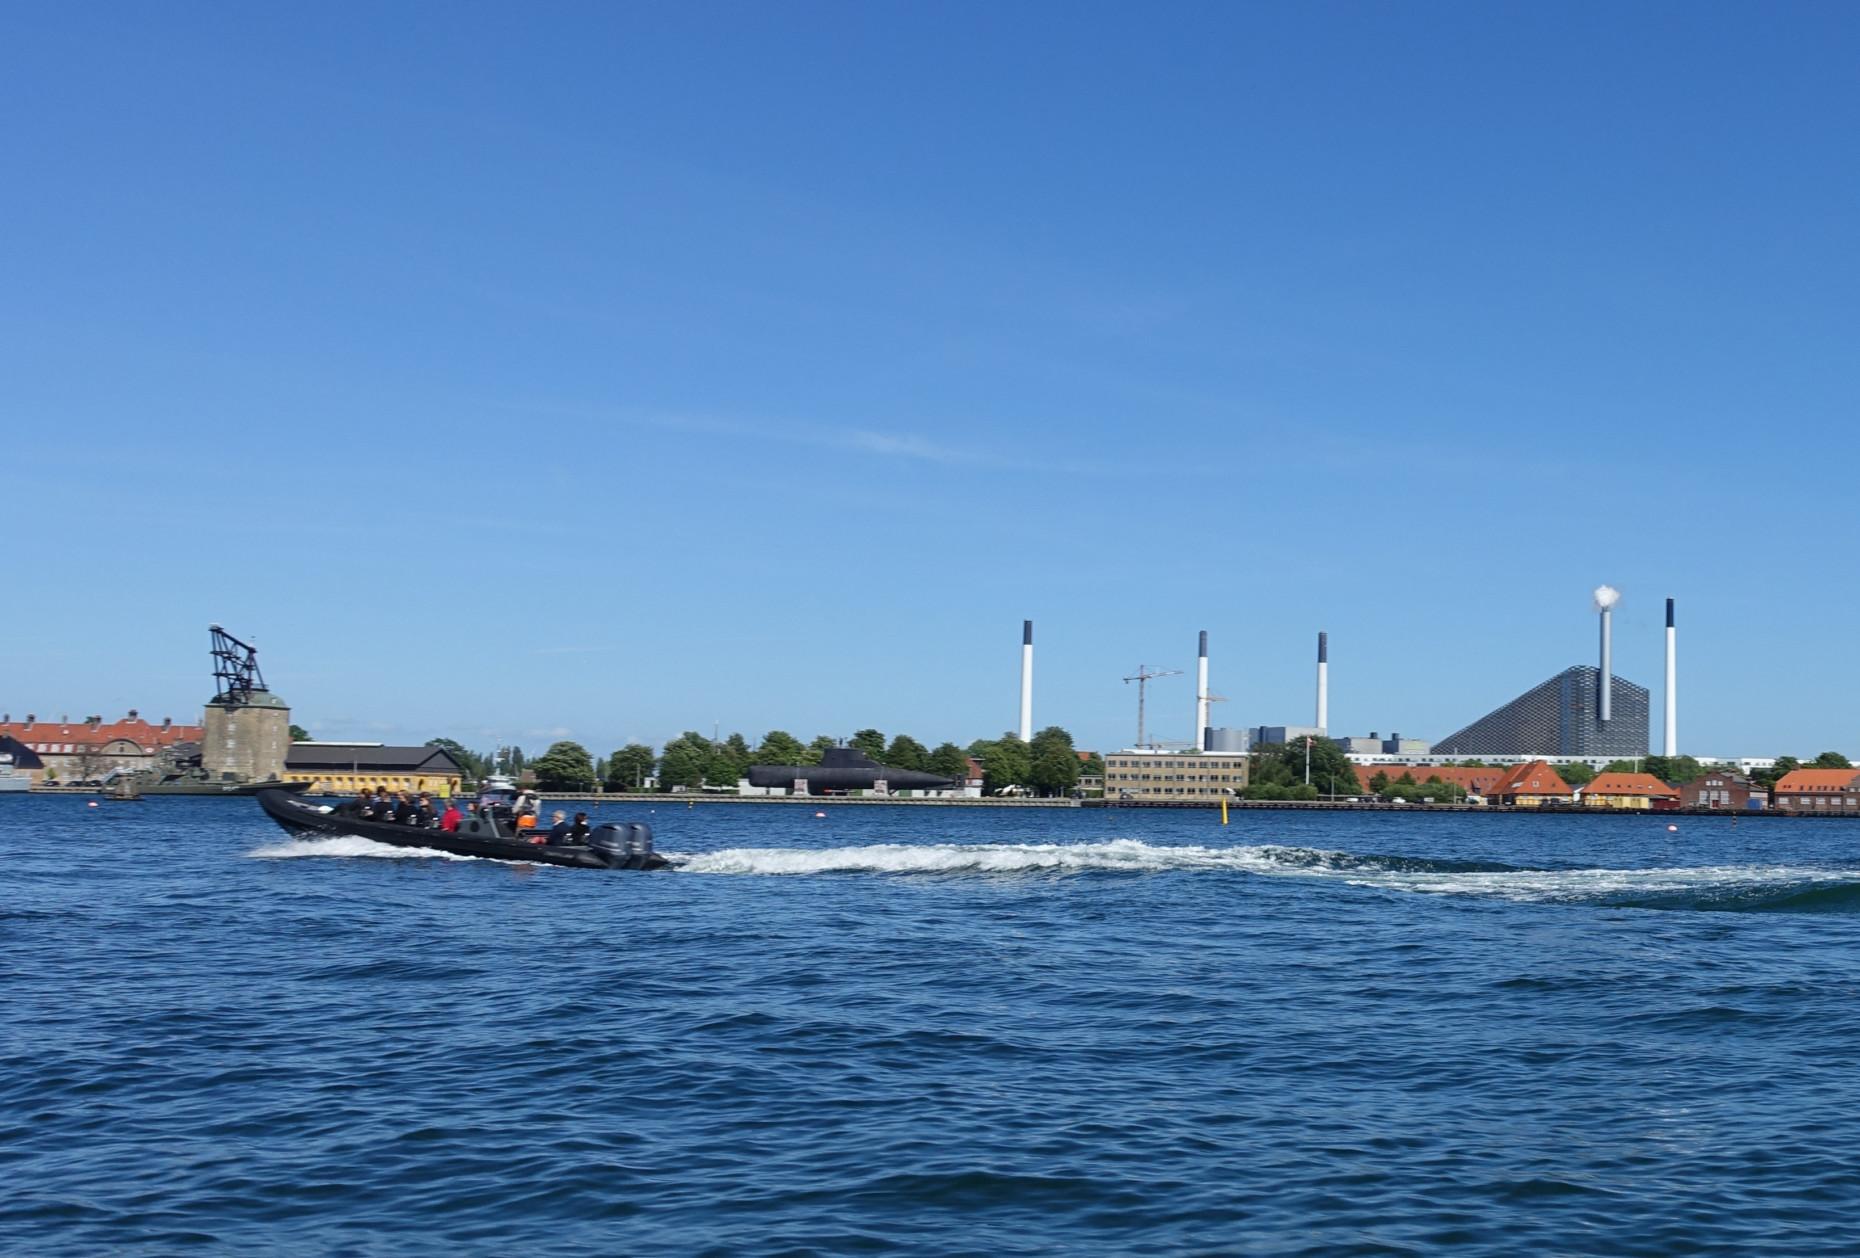 Copenhagen's new landmark, the waste-to-energy-plant with ski track from BIG - Bjarke Ingels Group.